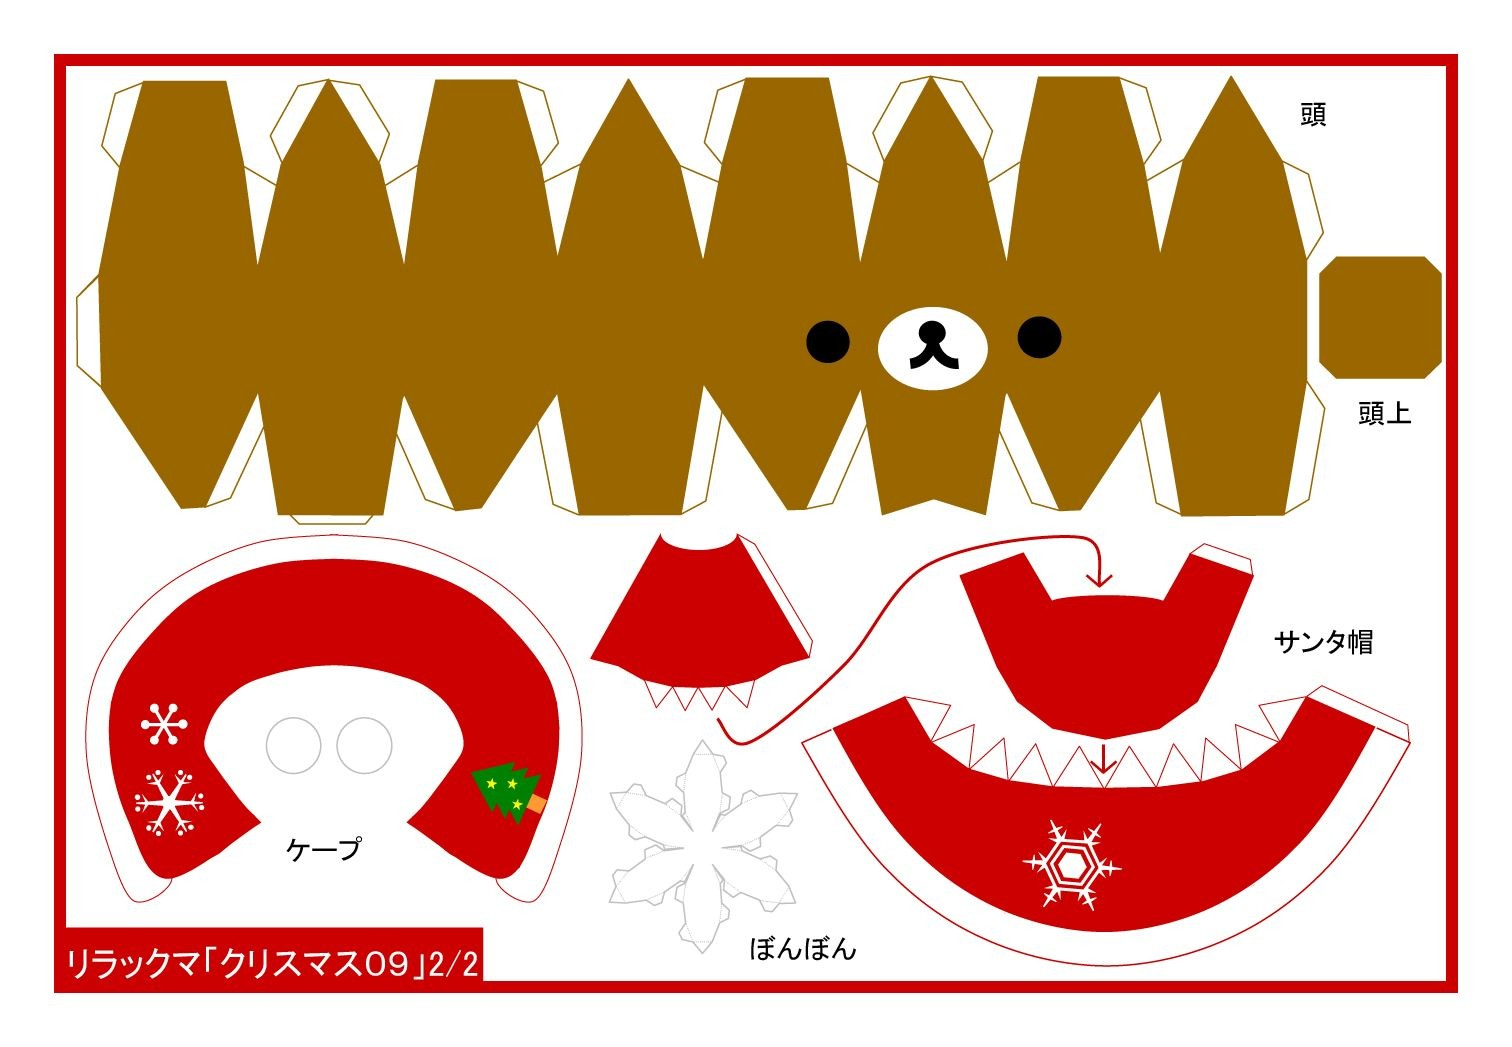 Rilakkuma Papercraft Blog Imgs 32 origin Fc2 K U M Kuma0rila Ddf